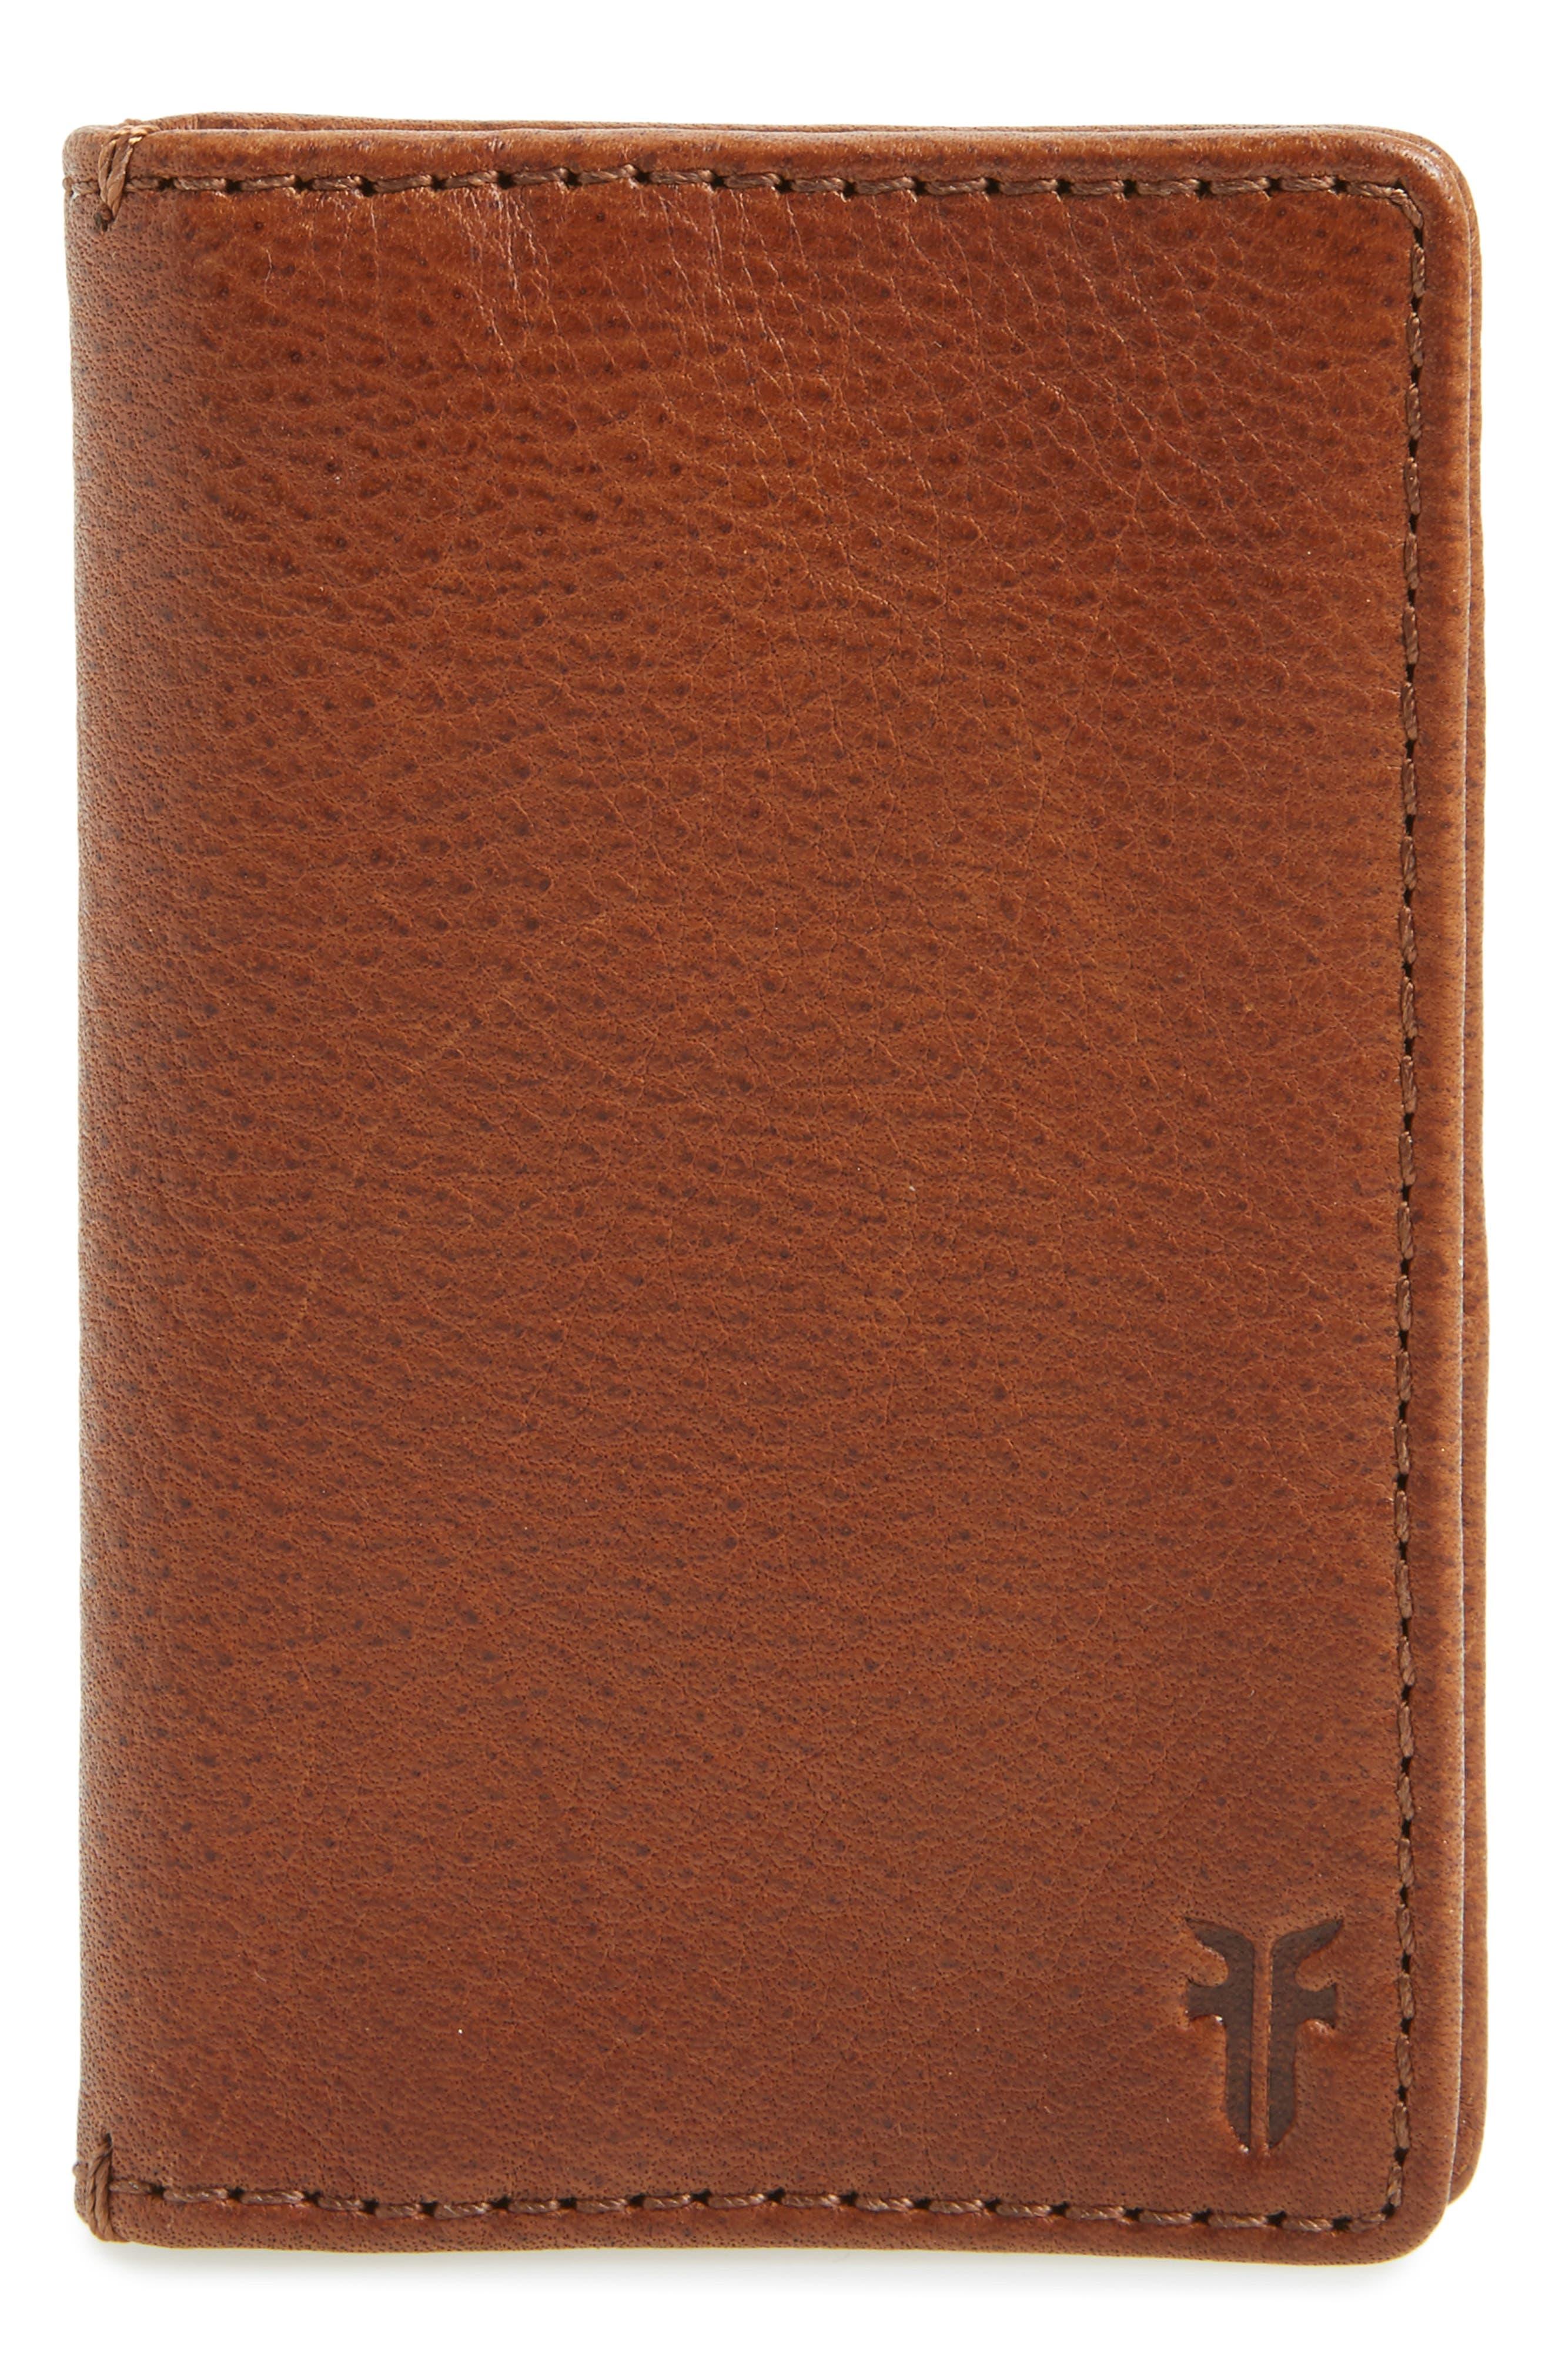 Oliver Leather Wallet,                             Main thumbnail 1, color,                             Cognac